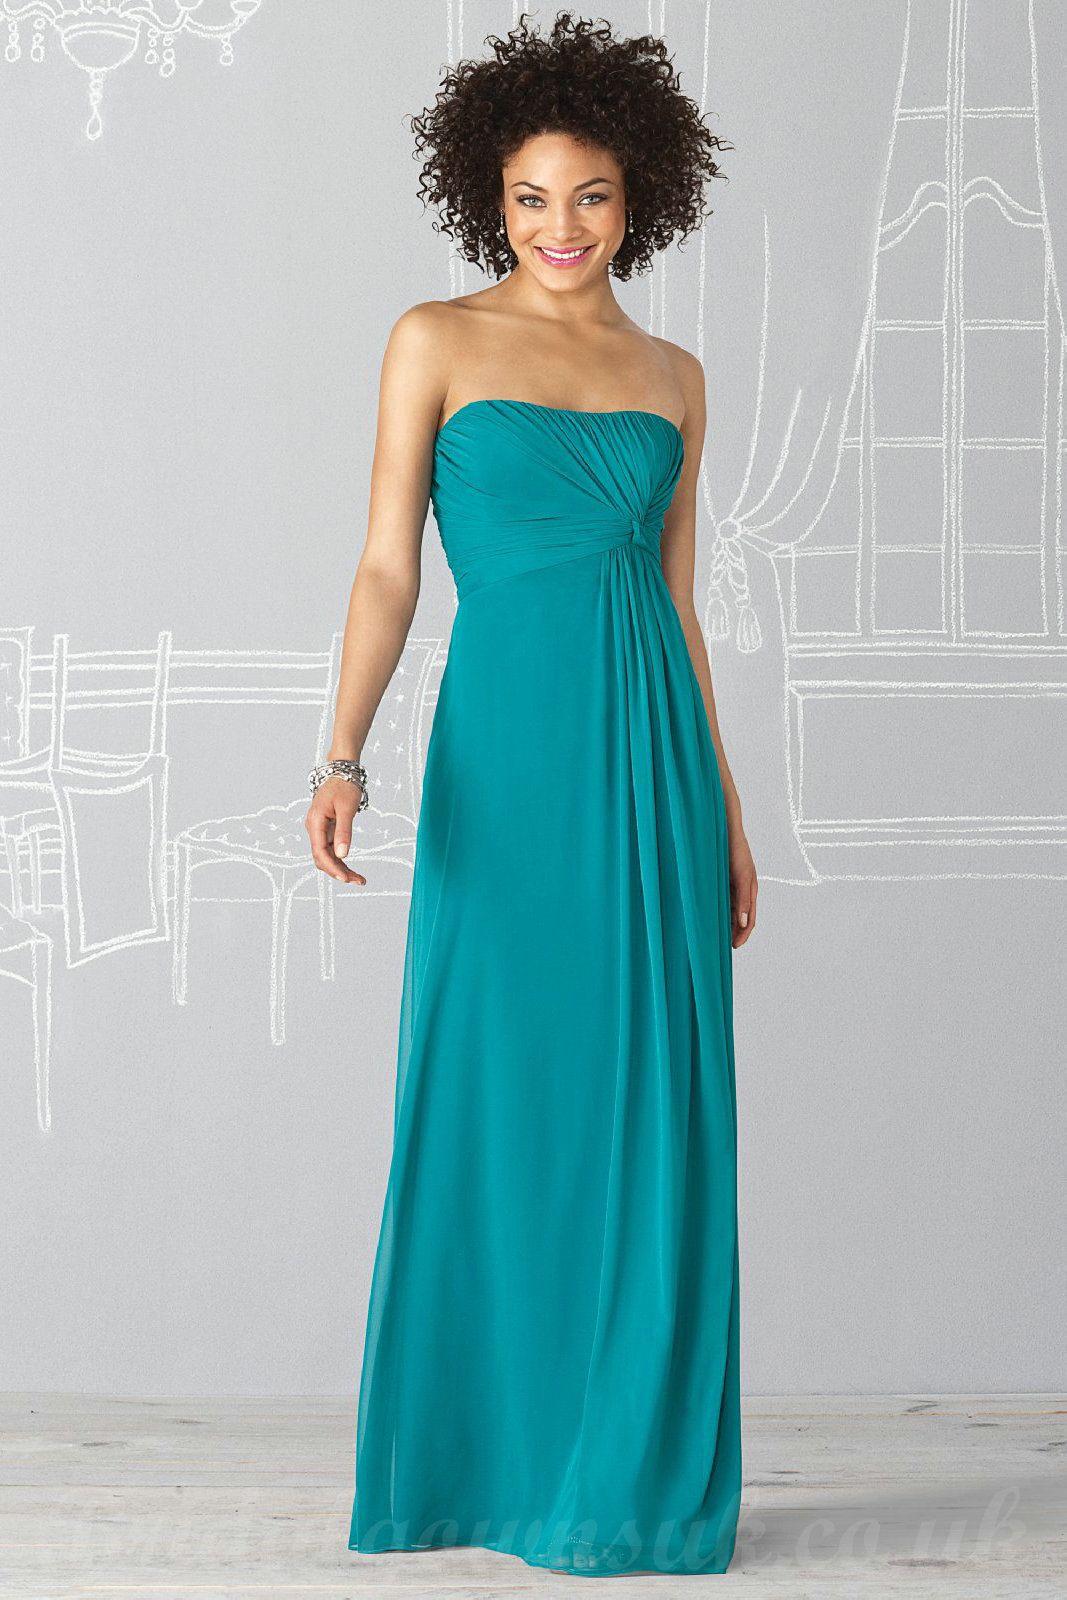 Bluebridesmaiddresses buy cheap strapless chiffon bright blue bluebridesmaiddresses buy cheap strapless chiffon bright blue bridesmaid dress online ombrellifo Gallery